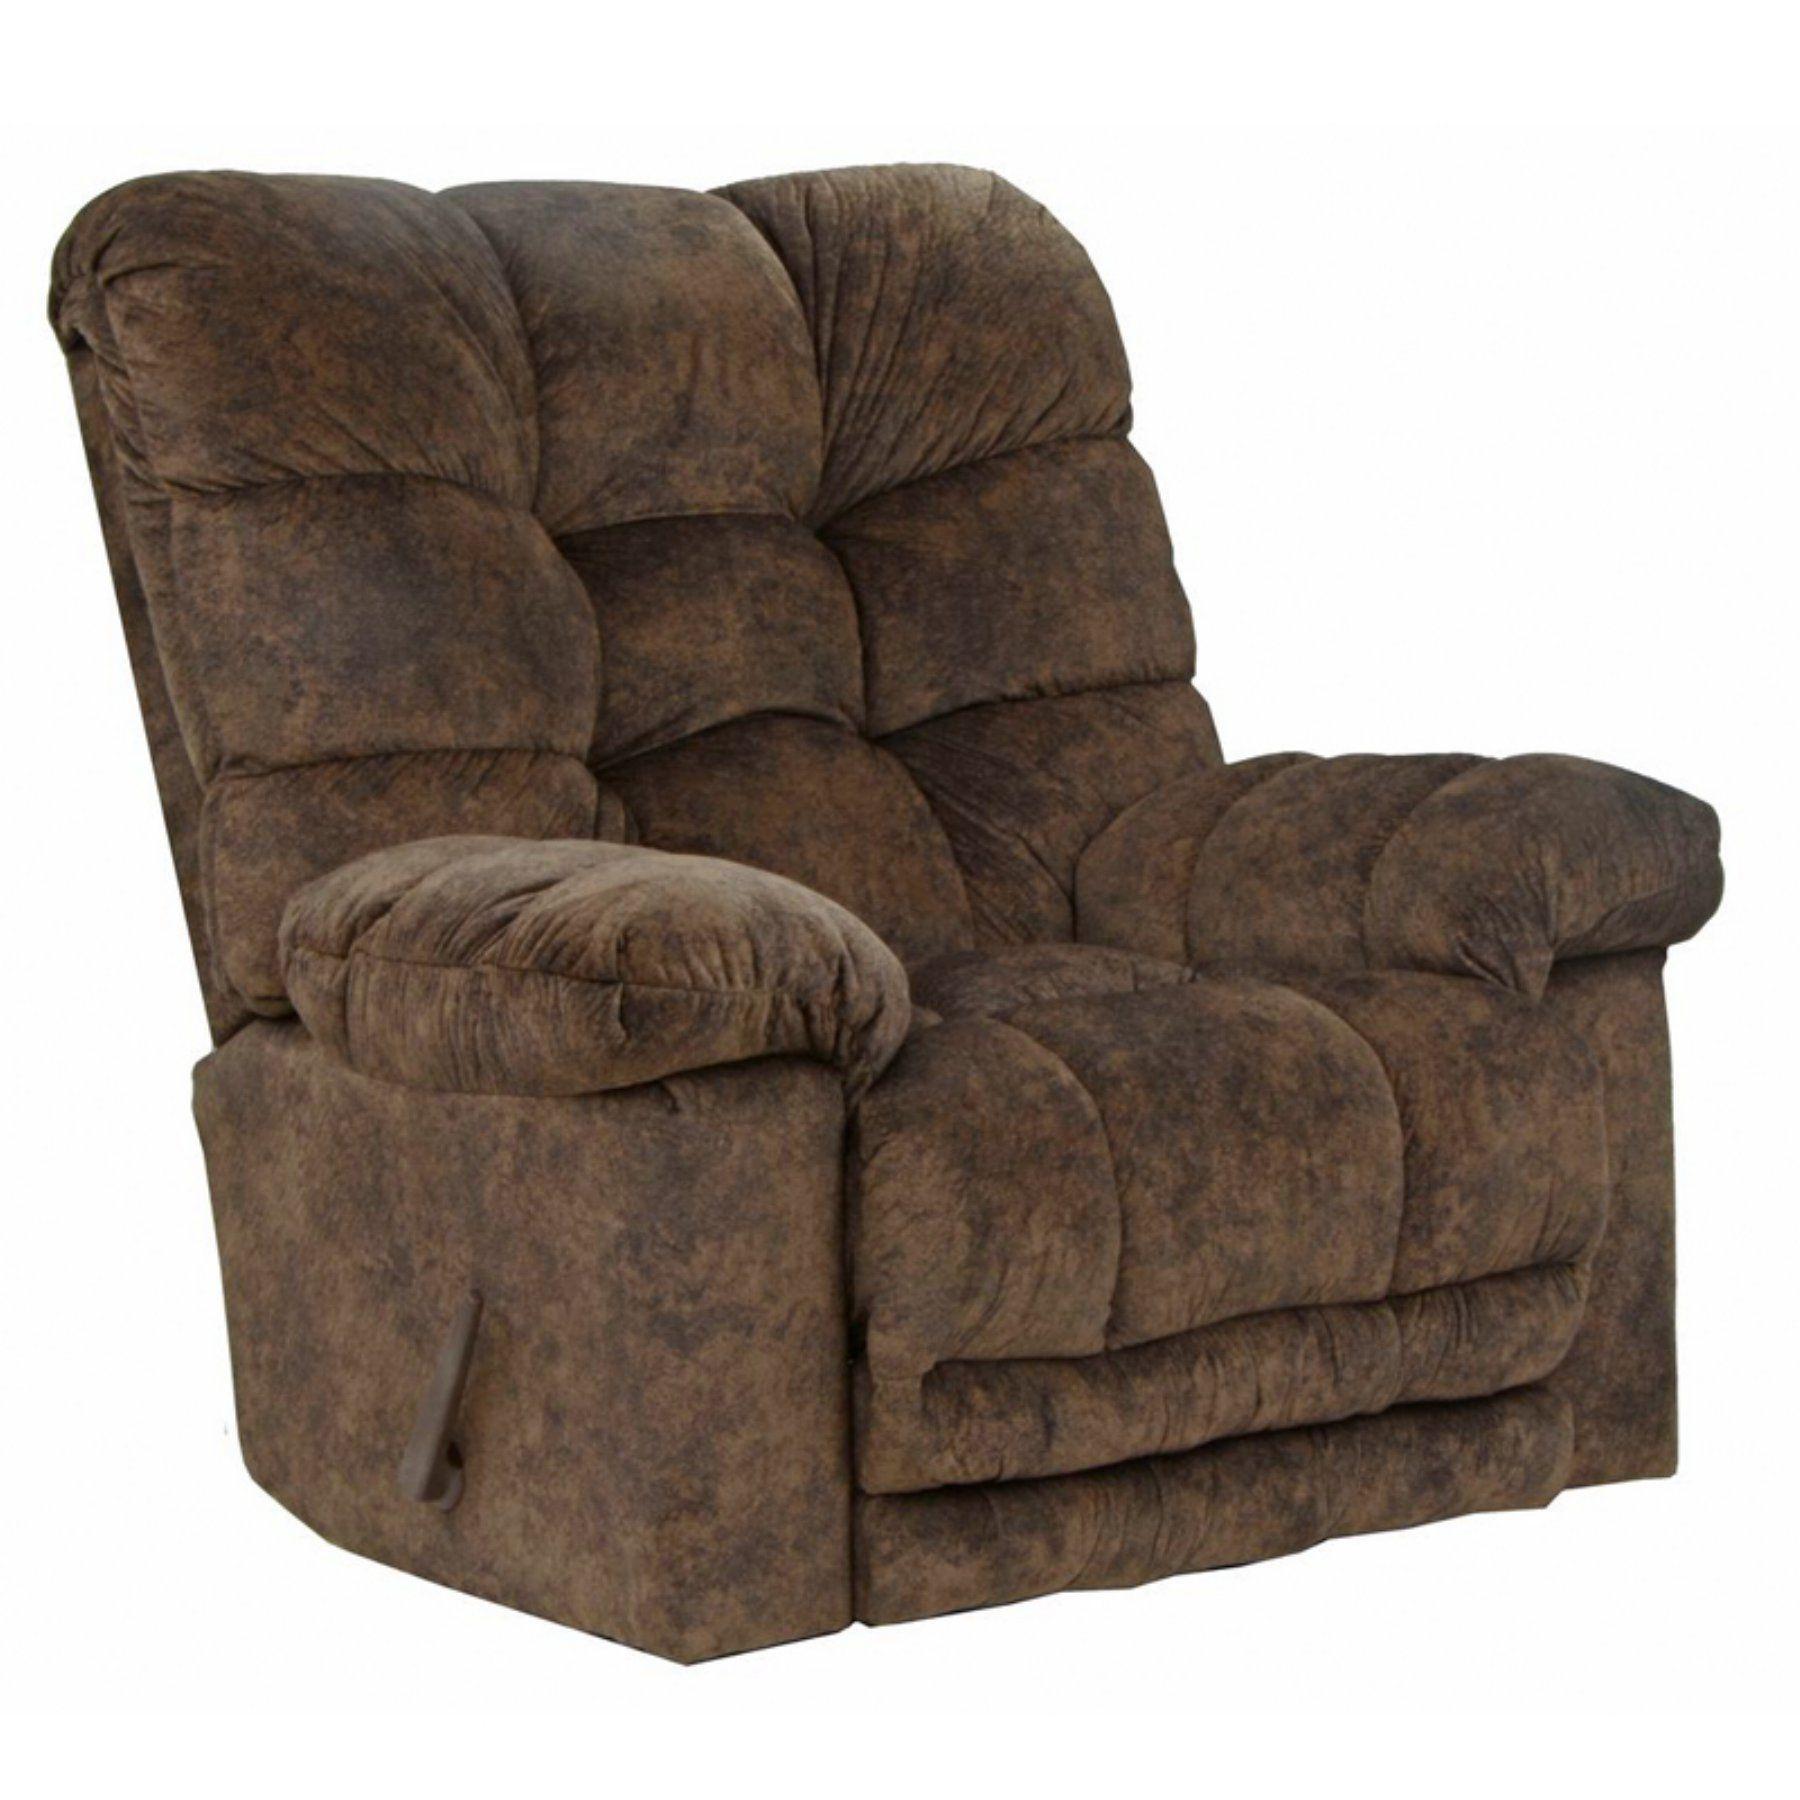 Peachy Catnapper Bronson Polyester Chaise Rocker Recliner 4690 2 Lamtechconsult Wood Chair Design Ideas Lamtechconsultcom